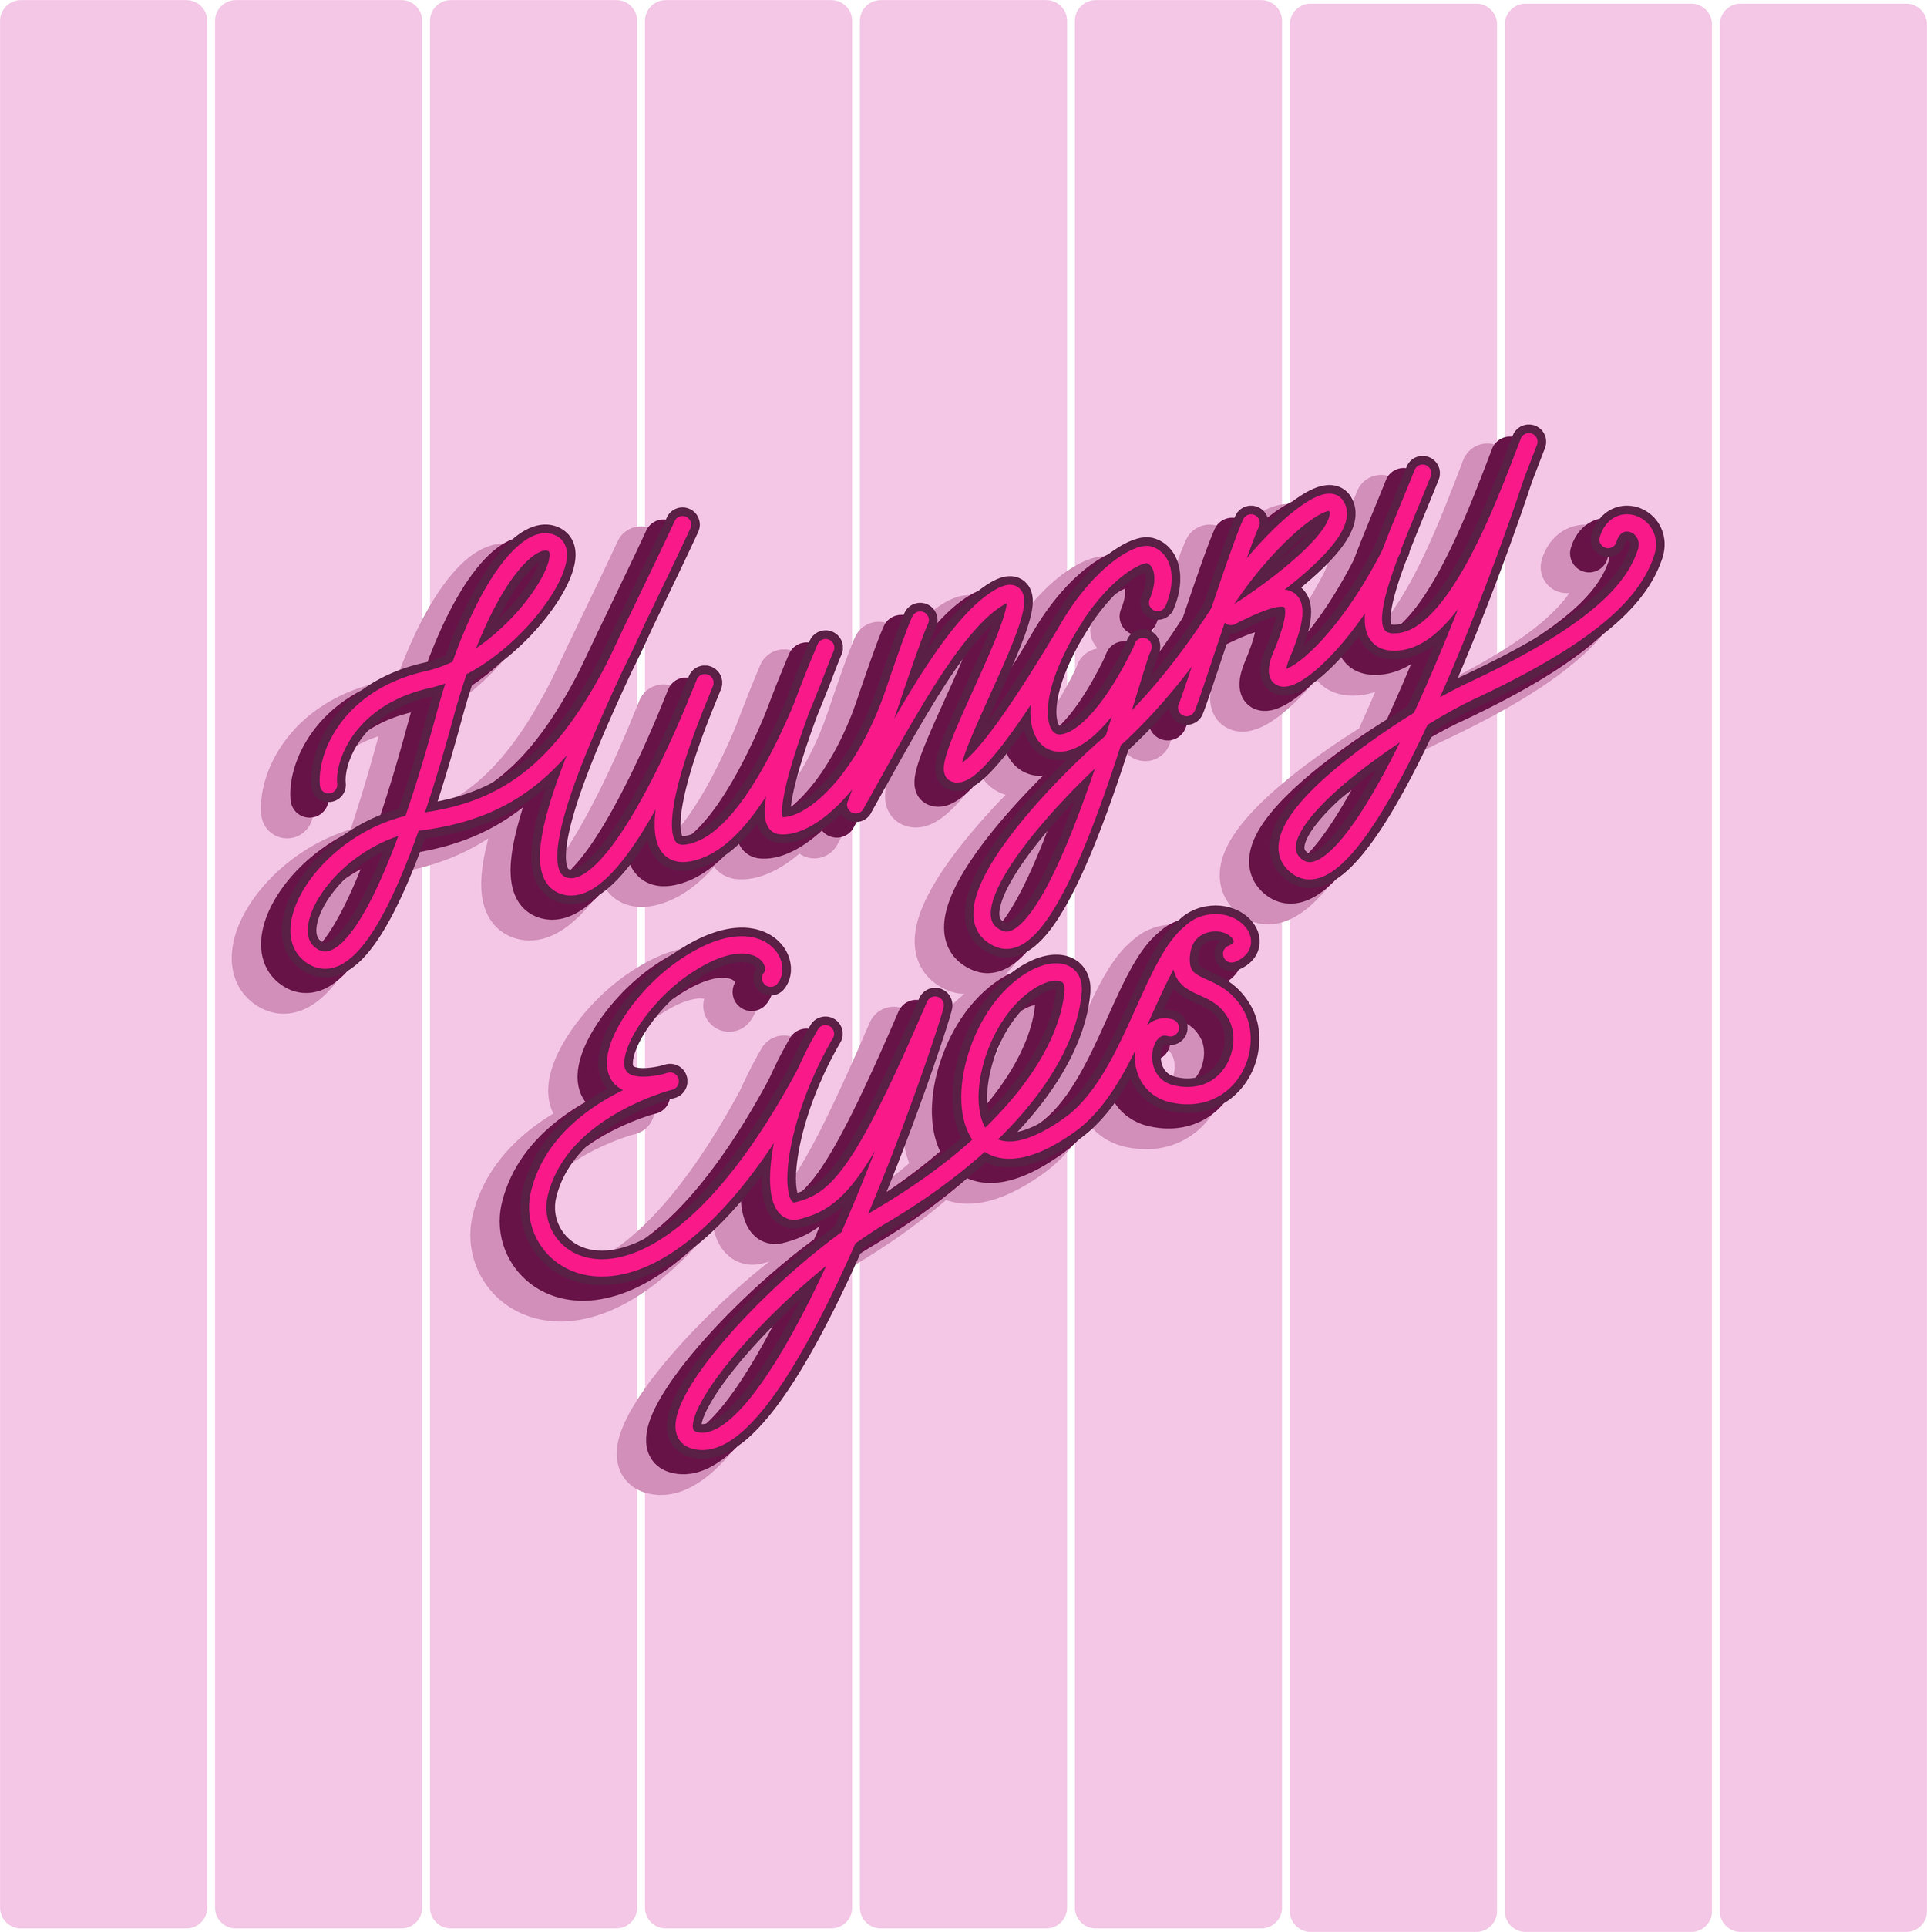 HUNGRY-EYES-2017.jpg